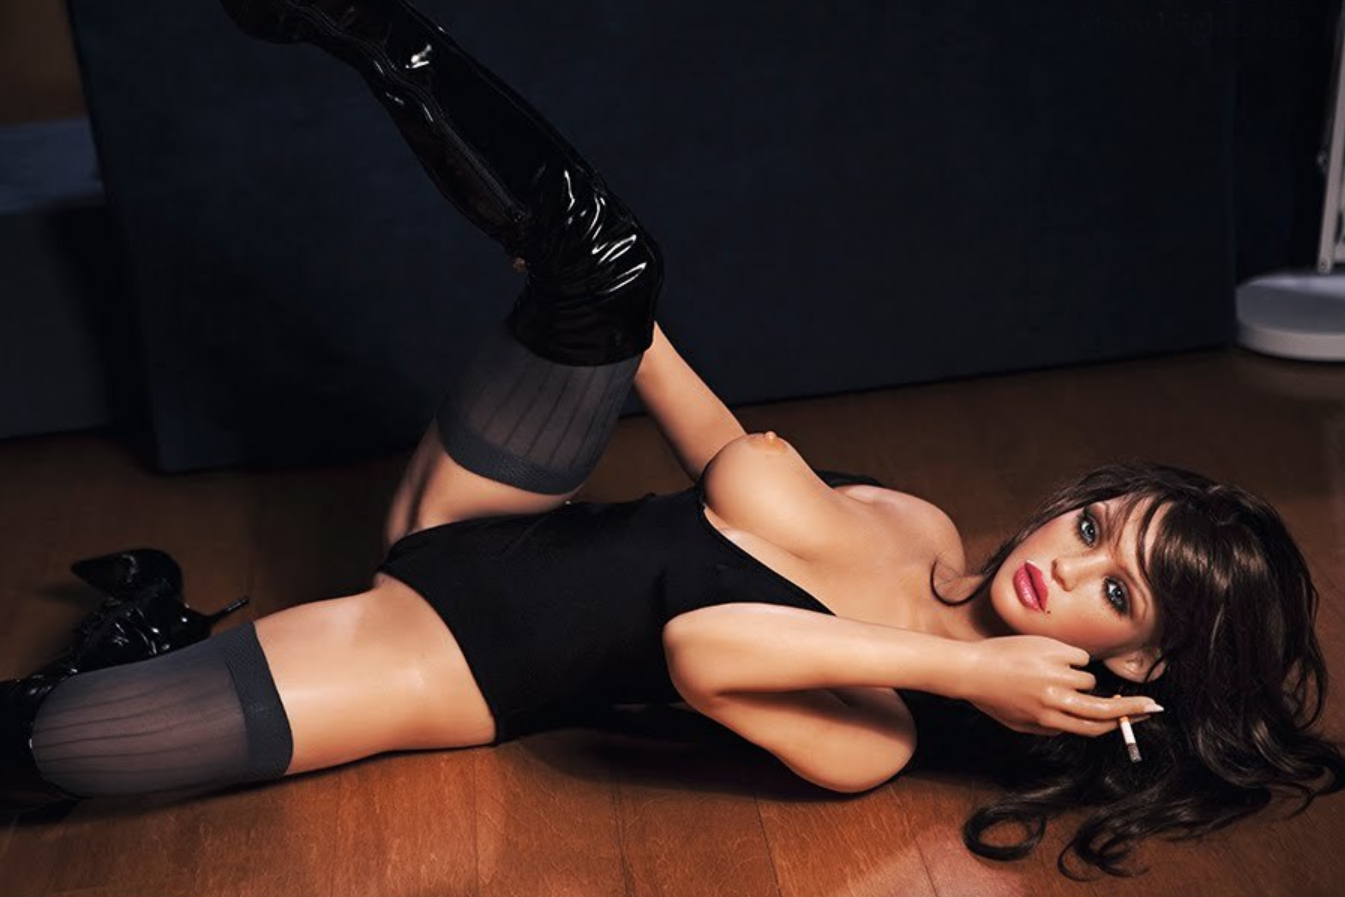 Секс кукла французкая 11 фотография